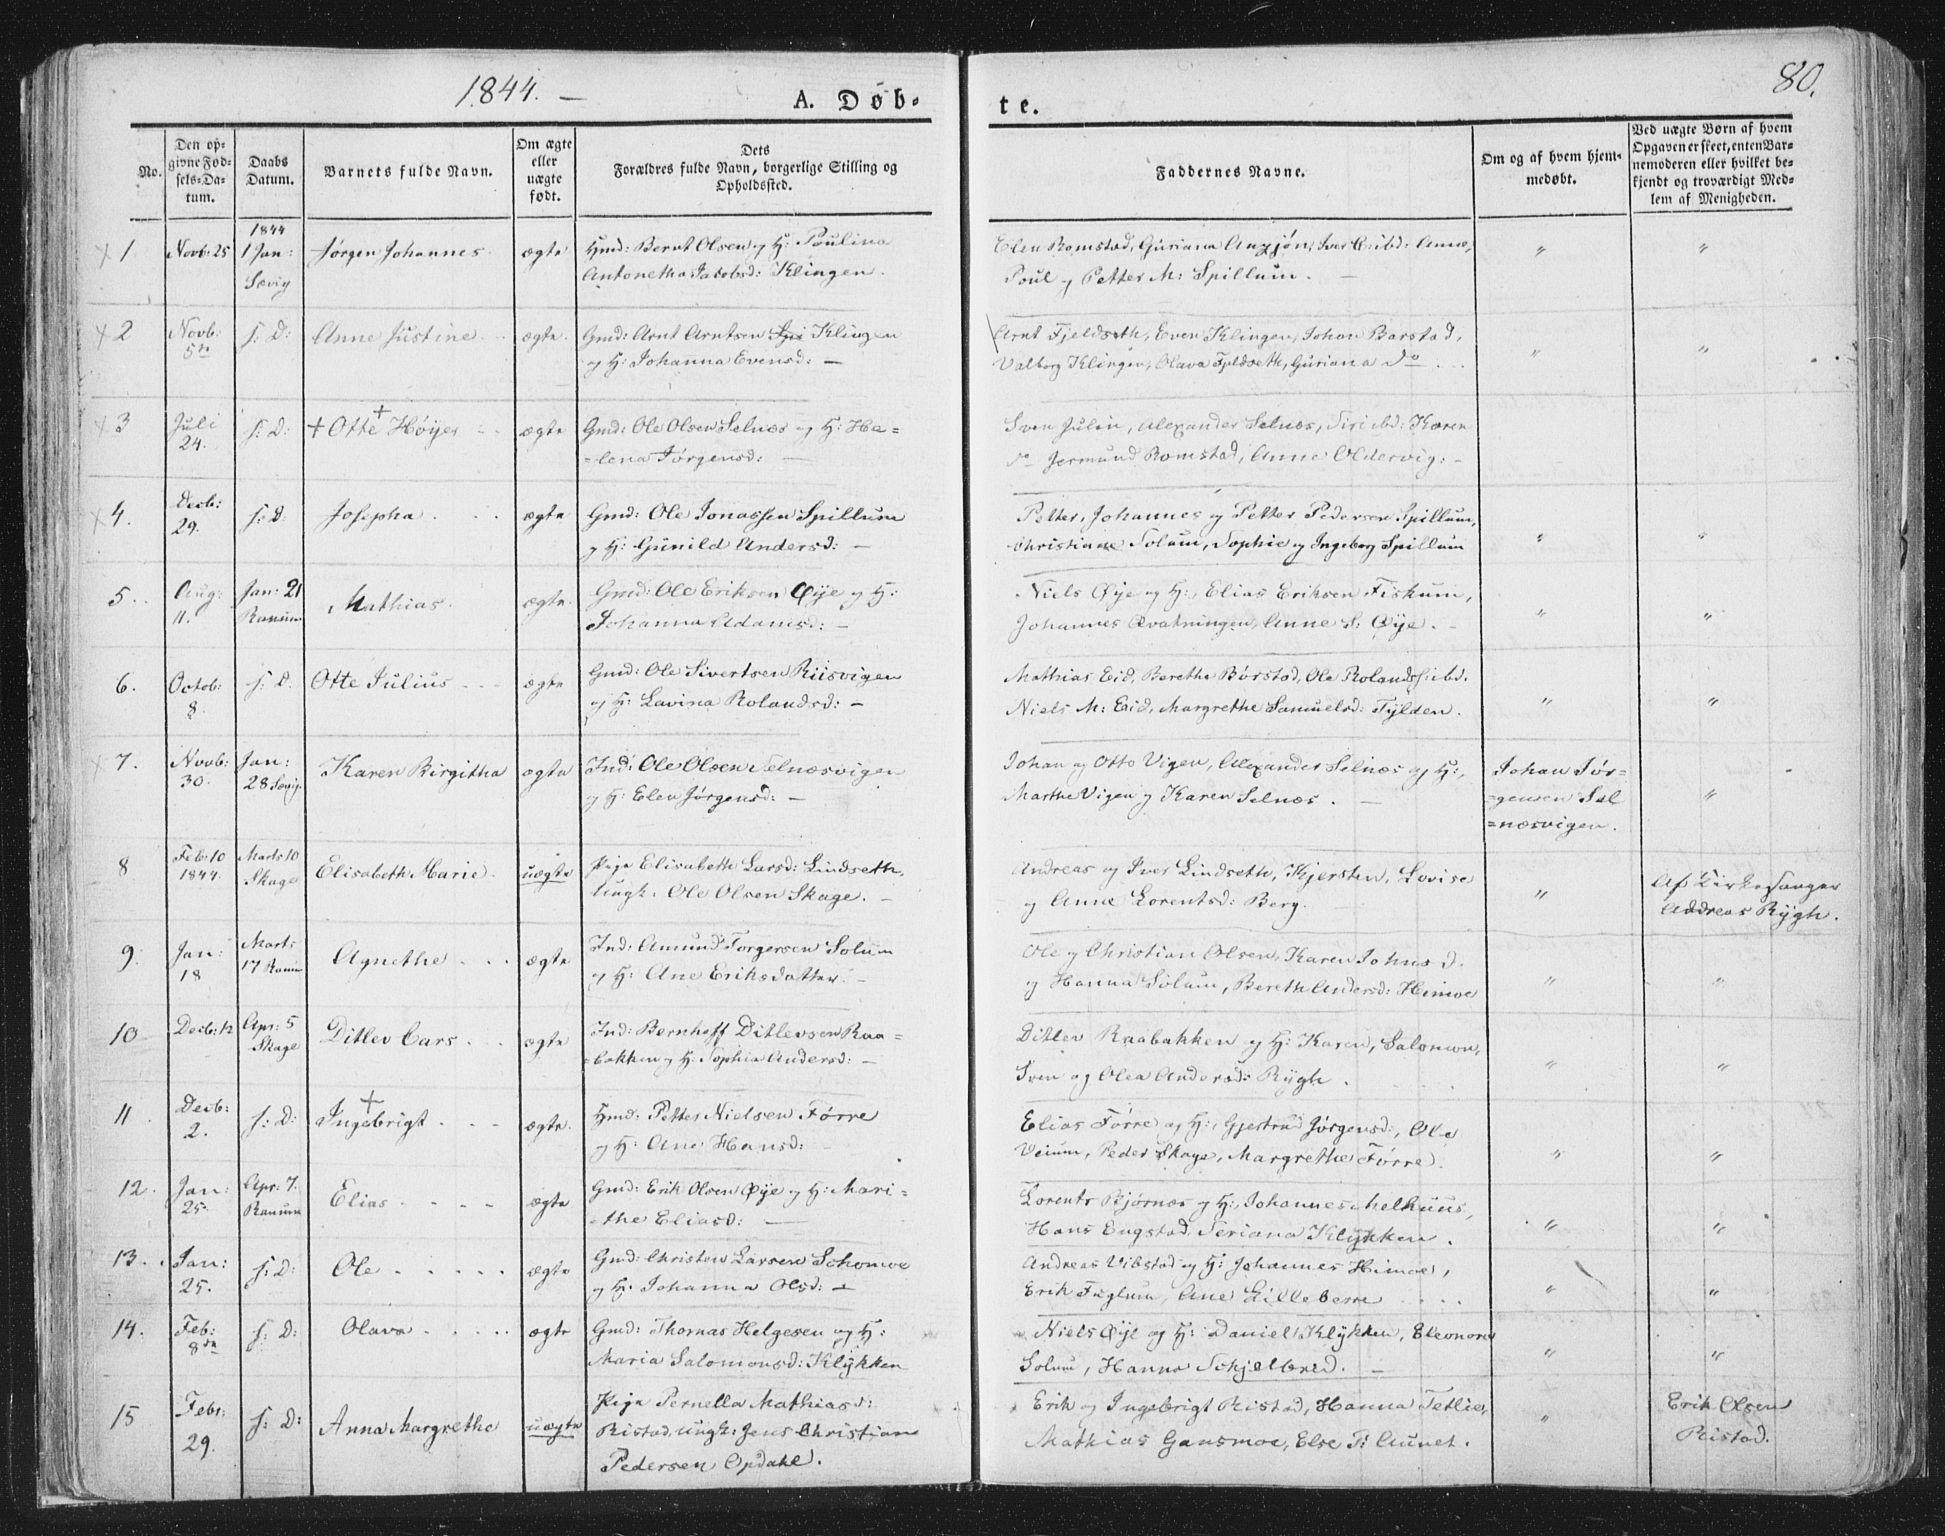 SAT, Ministerialprotokoller, klokkerbøker og fødselsregistre - Nord-Trøndelag, 764/L0551: Ministerialbok nr. 764A07a, 1824-1864, s. 80